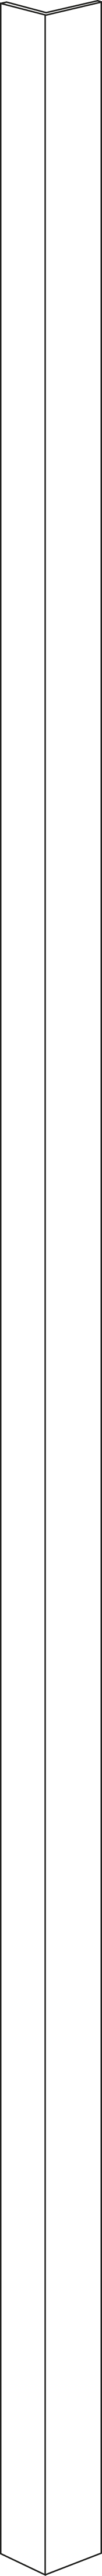 Sidolist S2/4 155 cm H/V. Vit